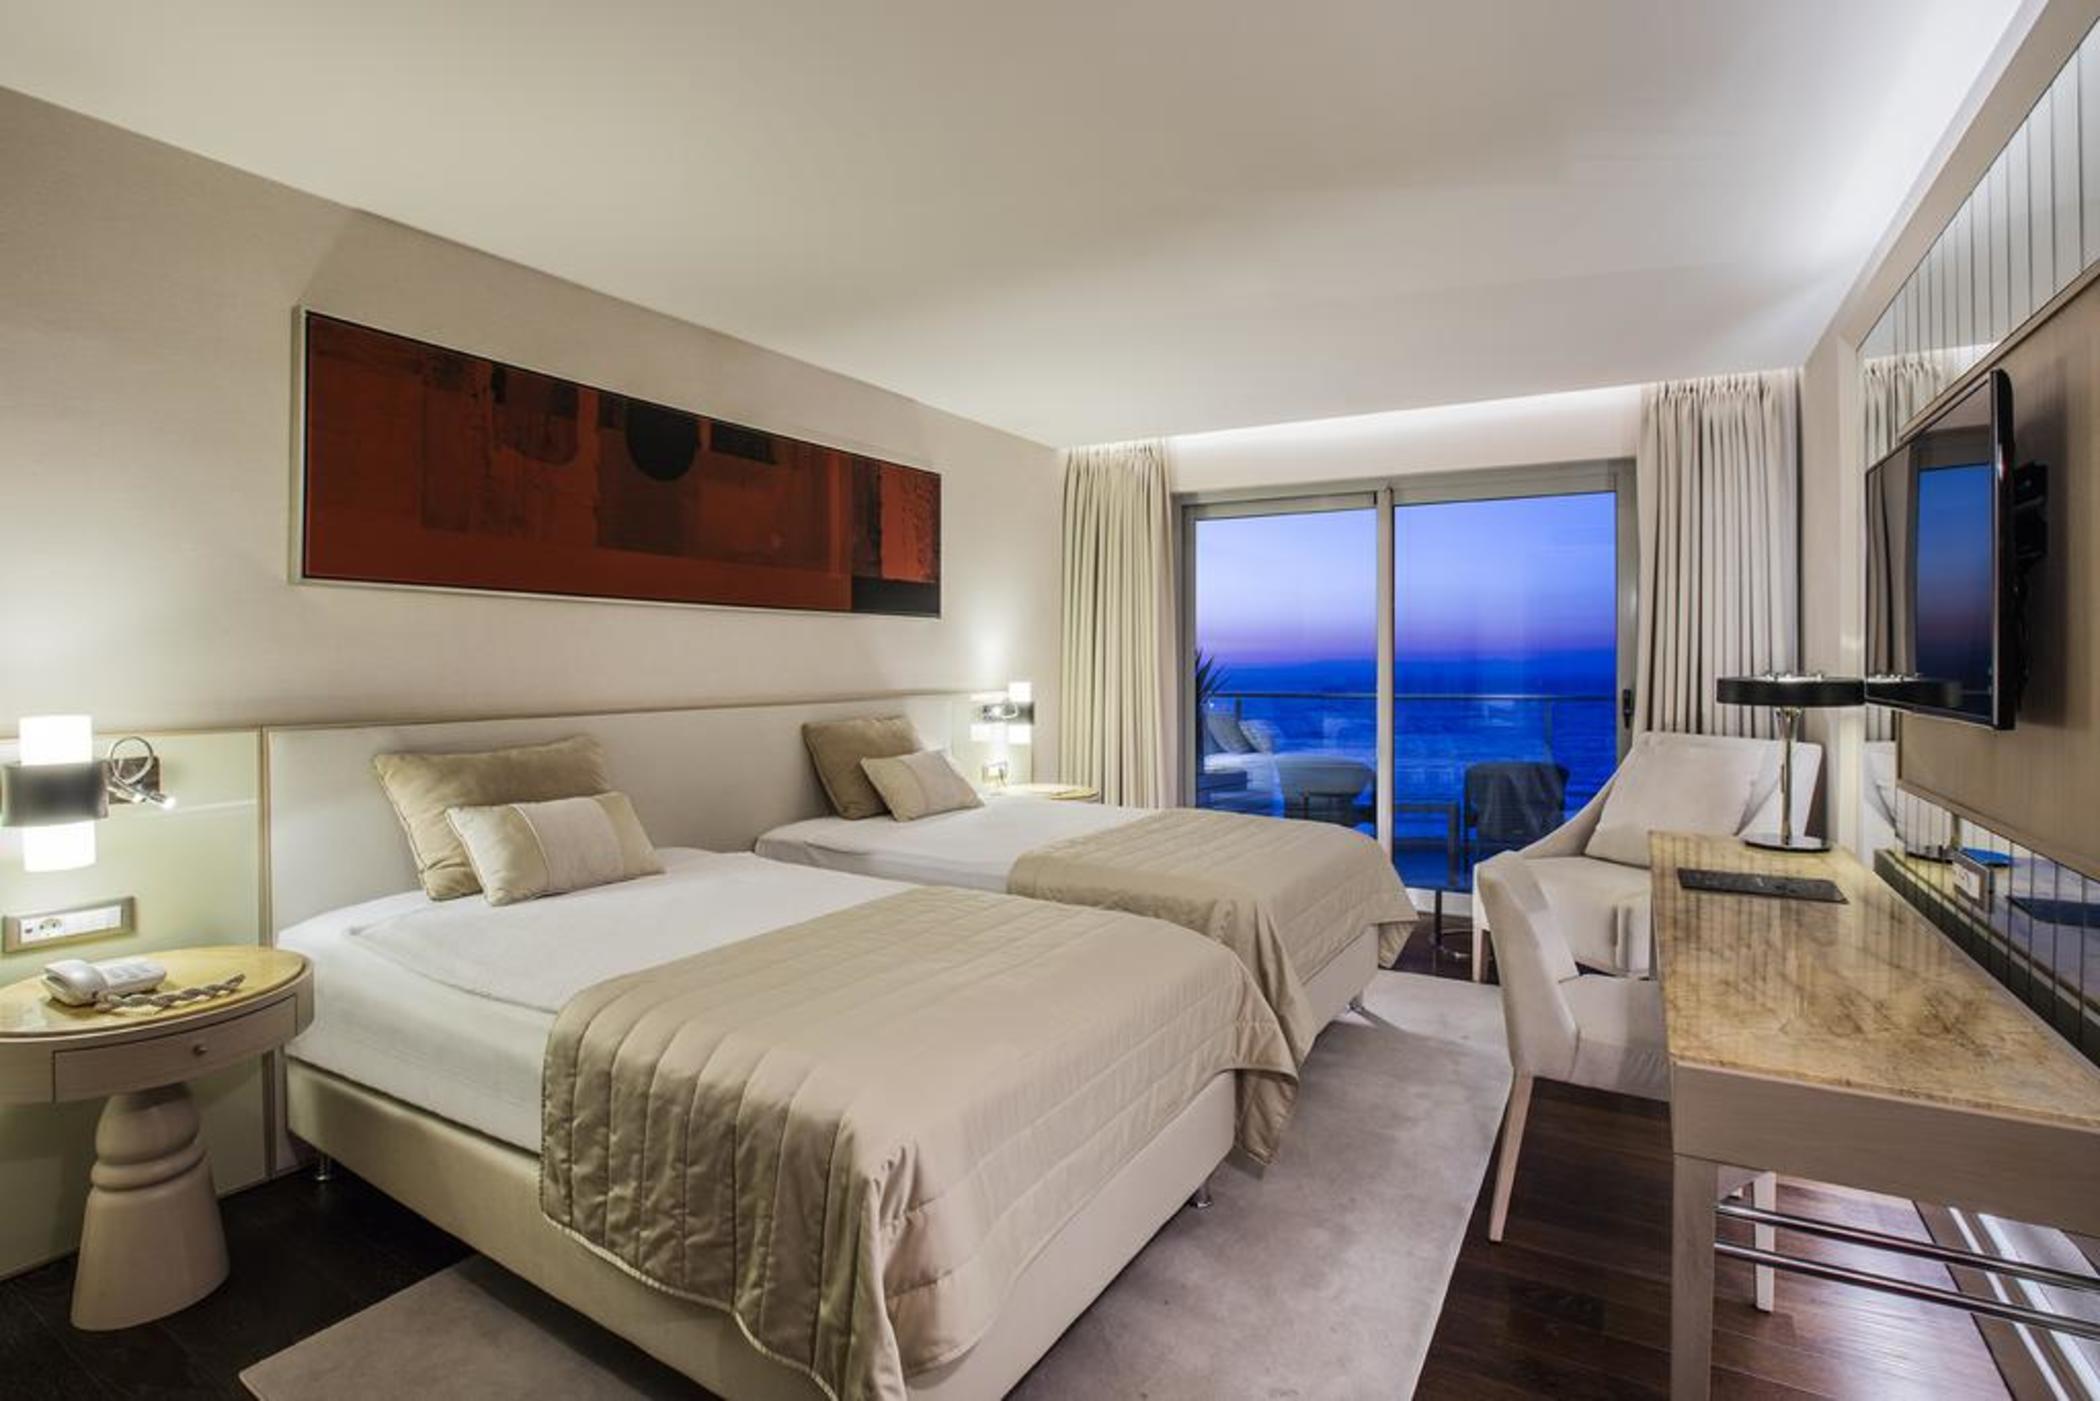 Charisma De Luxe Hotel